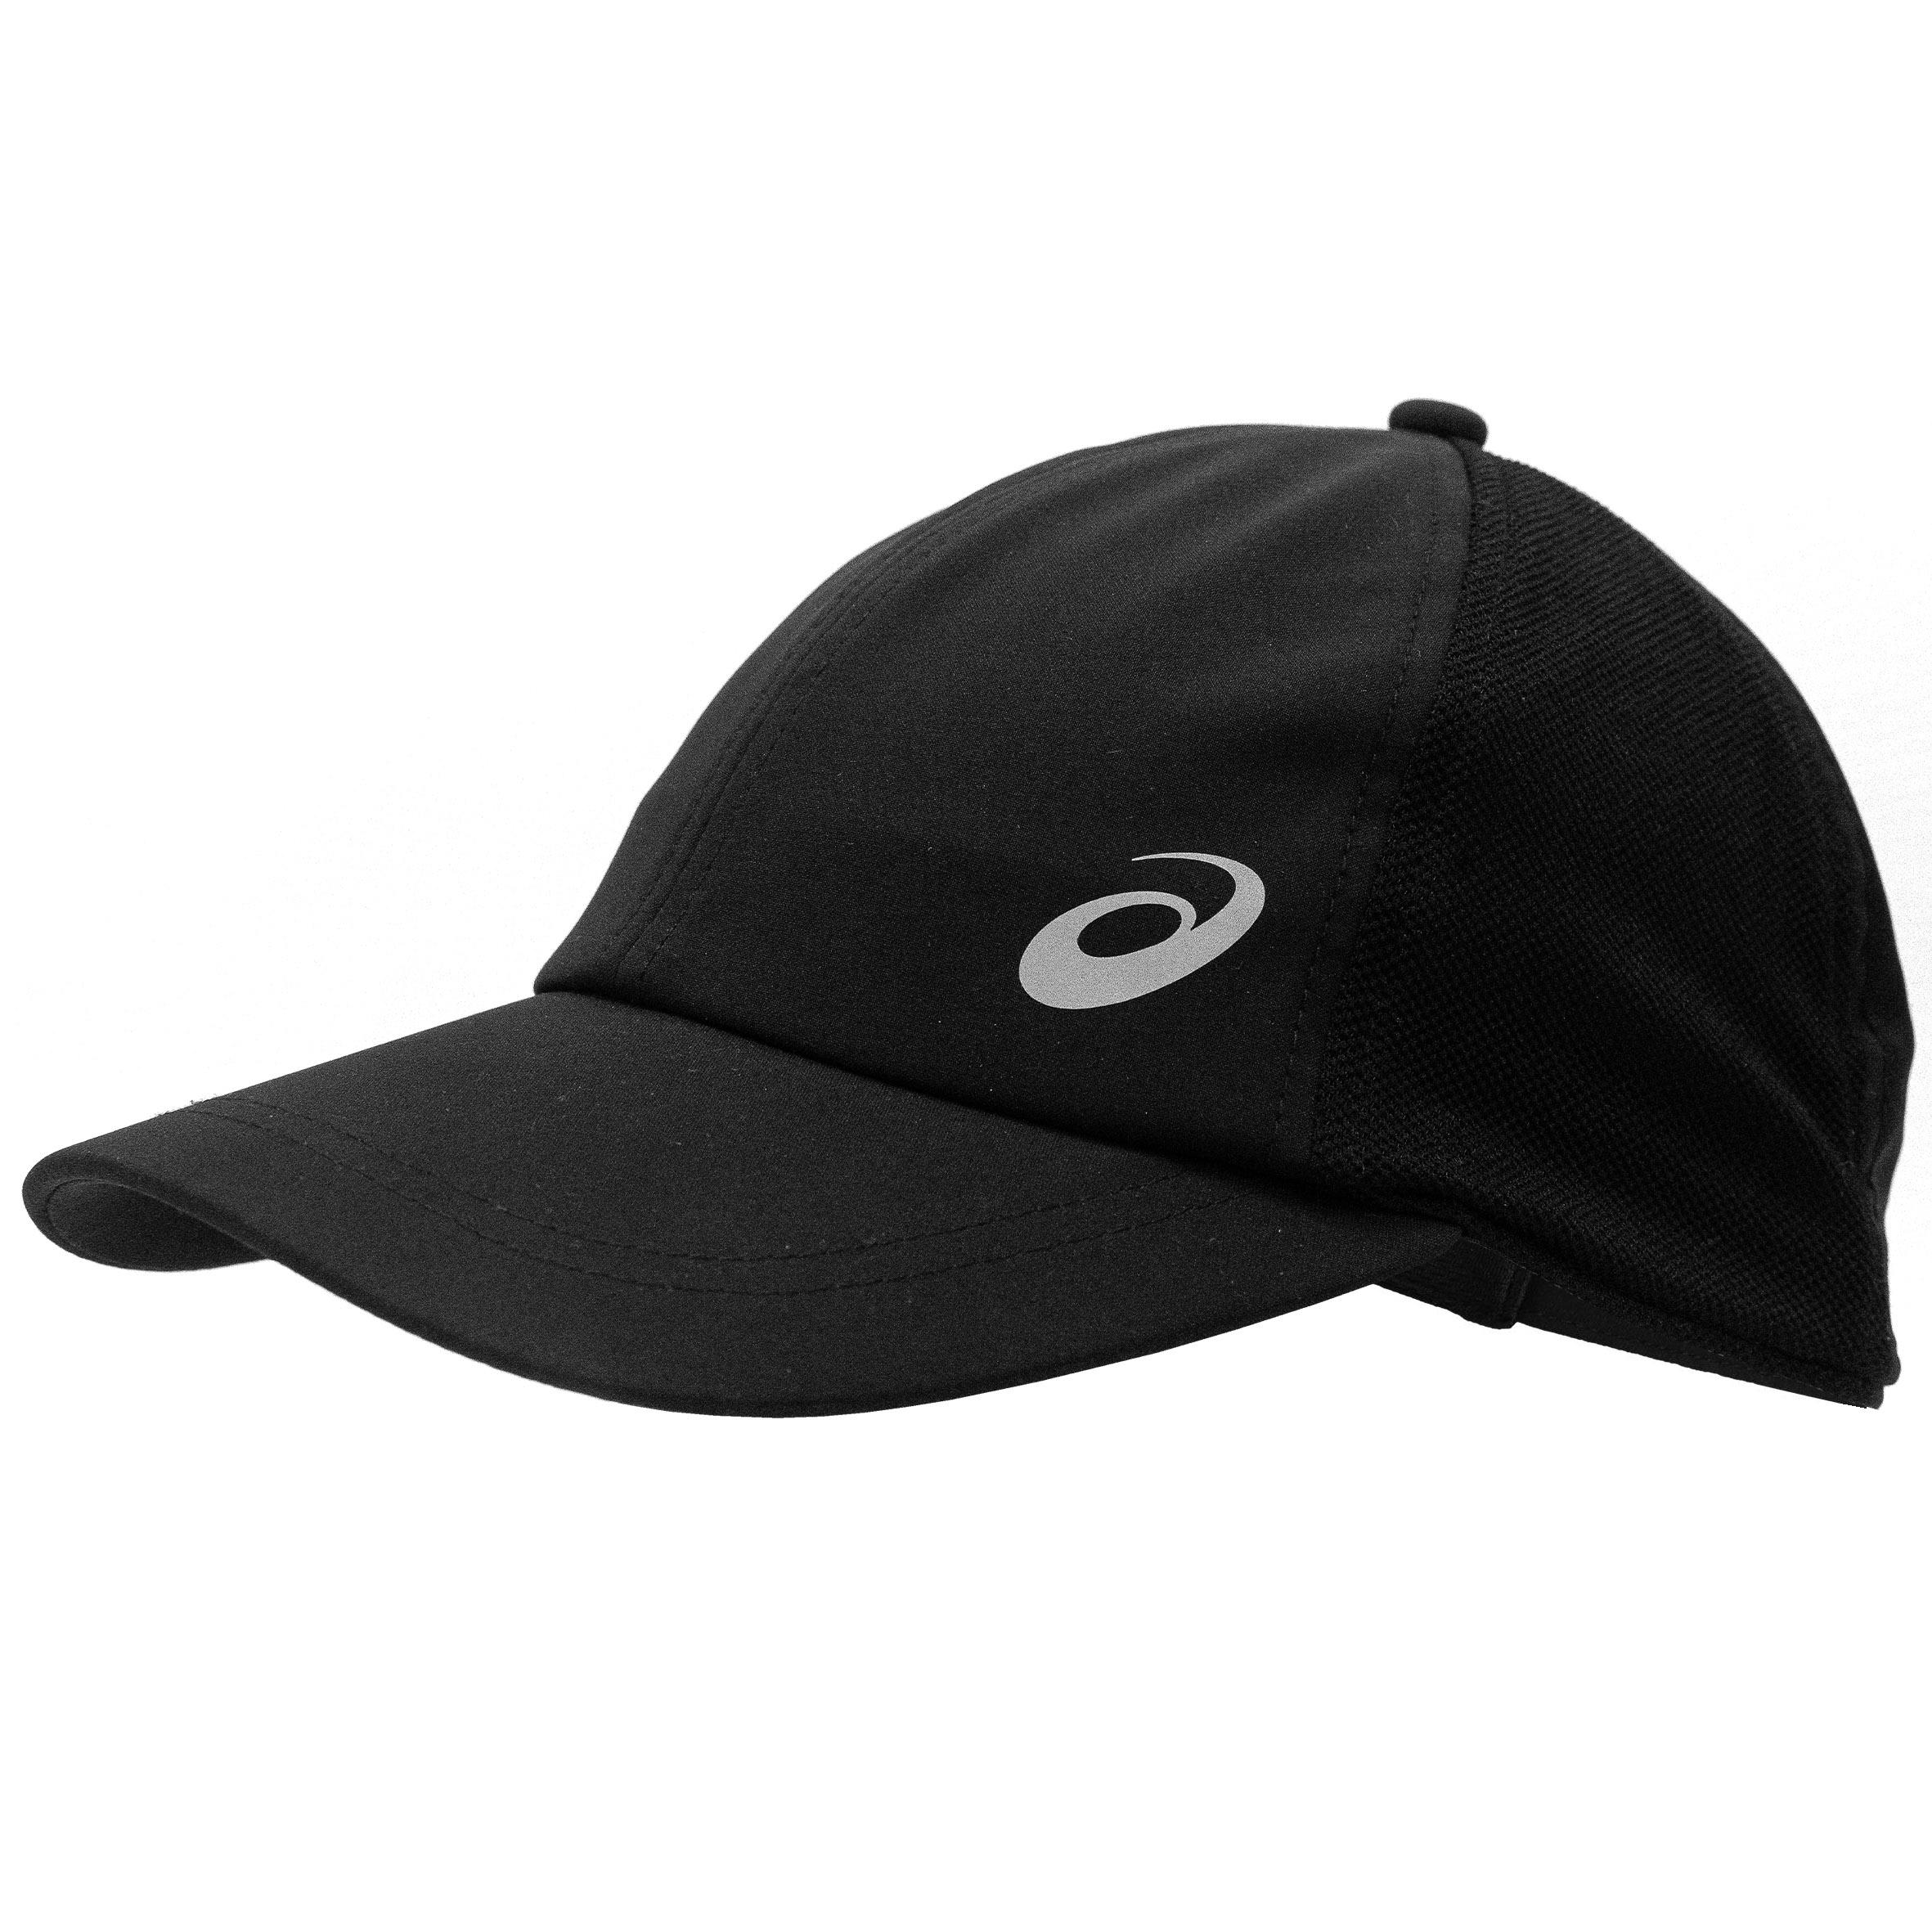 Șapcă Tenis Asics Negru la Reducere poza